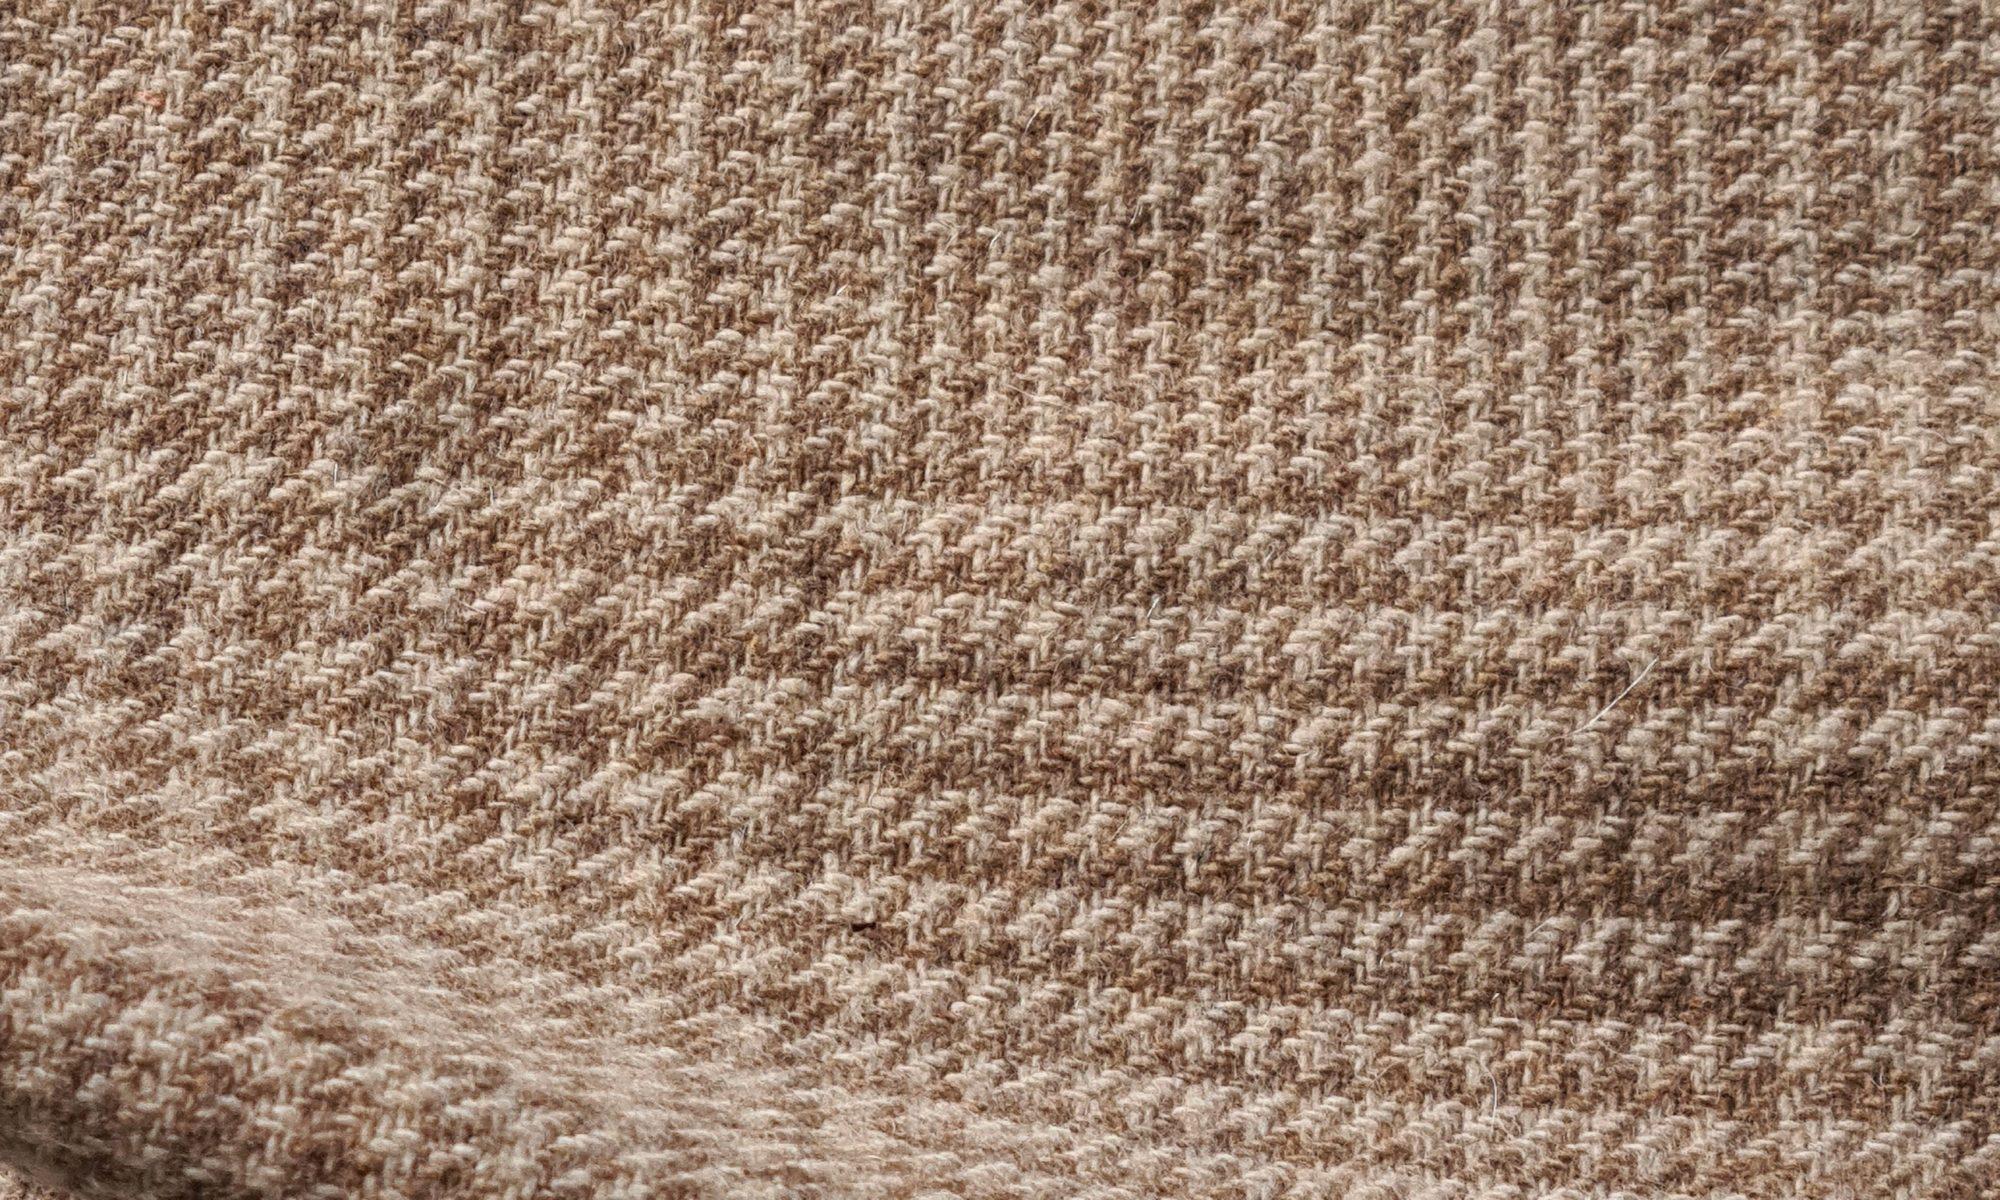 7587 tartan glen plaid brown jacket fabric WIDTH cm150 WEIGHT gr390 - gr260 square meter - COMPOSITION 70 wool 20 polyammide 10 cashmere - 350mts